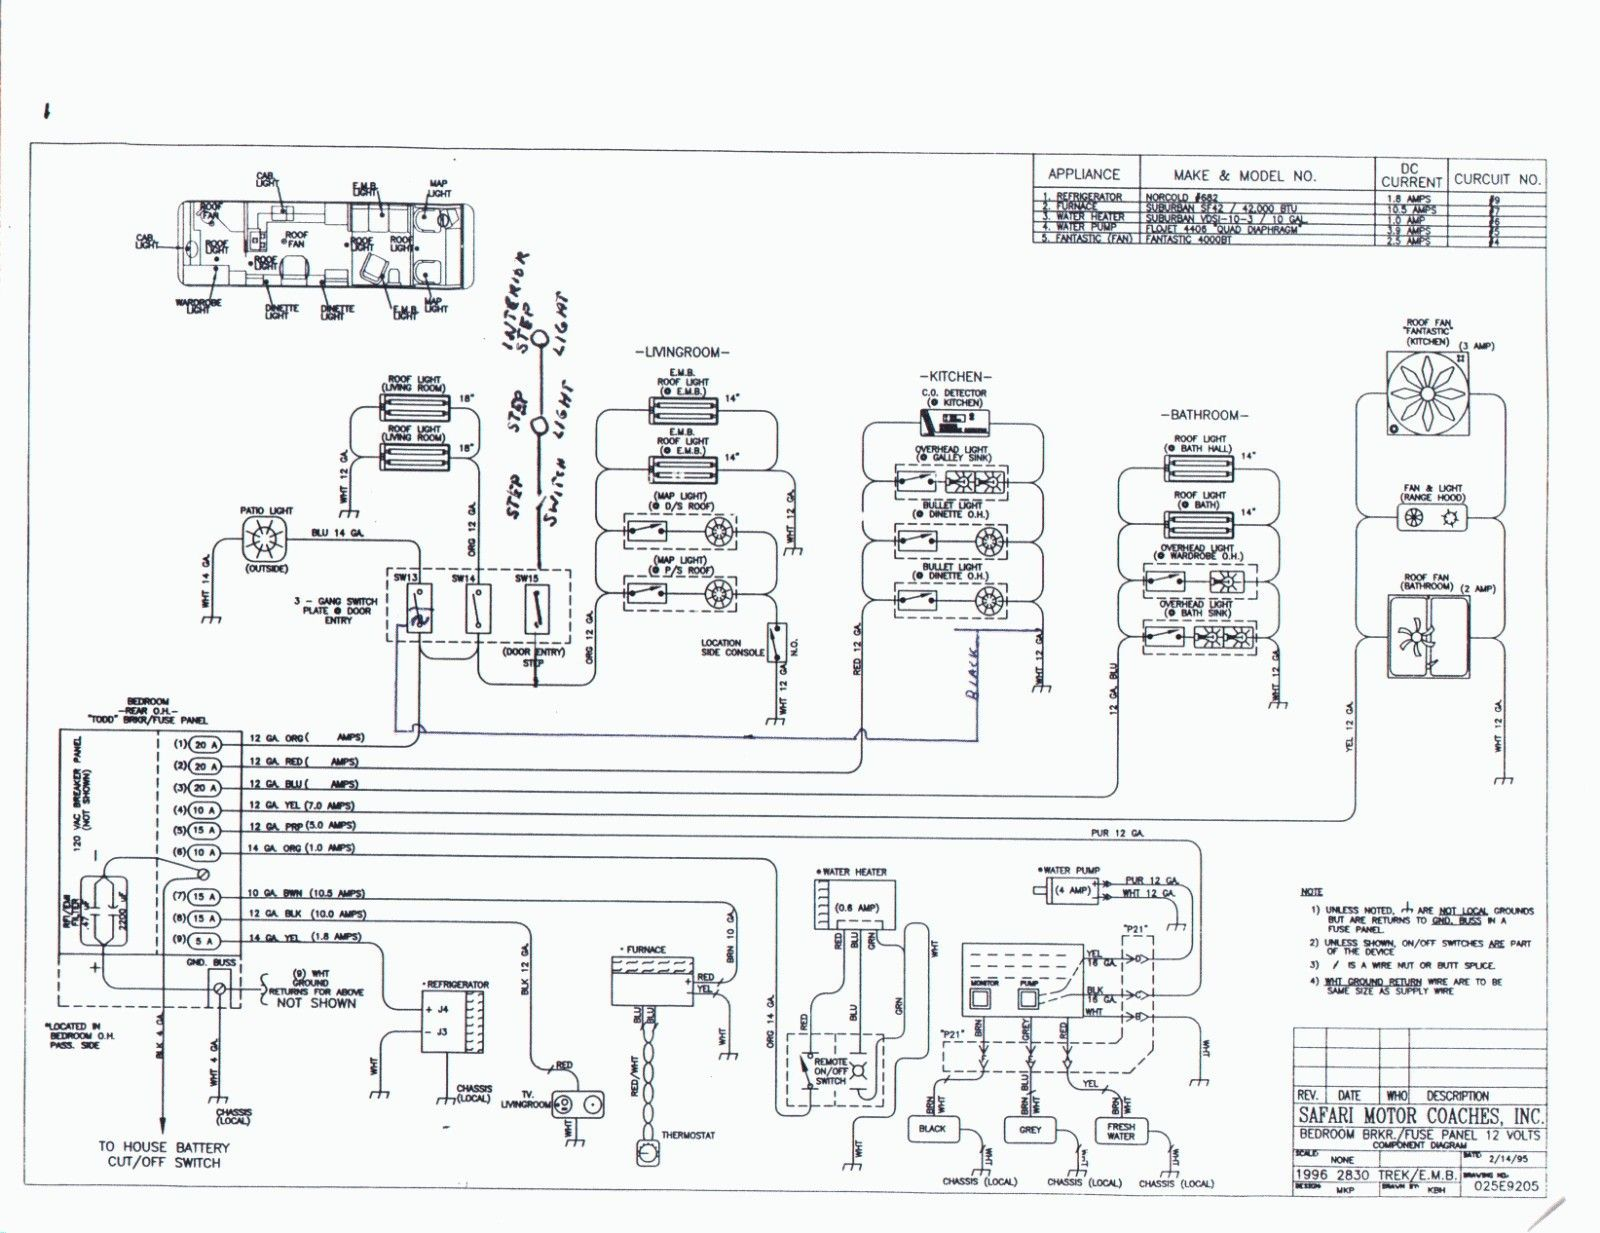 New Wiring Diagram Gfci Breaker Diagram Diagramsample Diagramtemplate Wiringdiagram Diagramchart Worksheet Worksheettemplate Diagram House Wiring Gfci